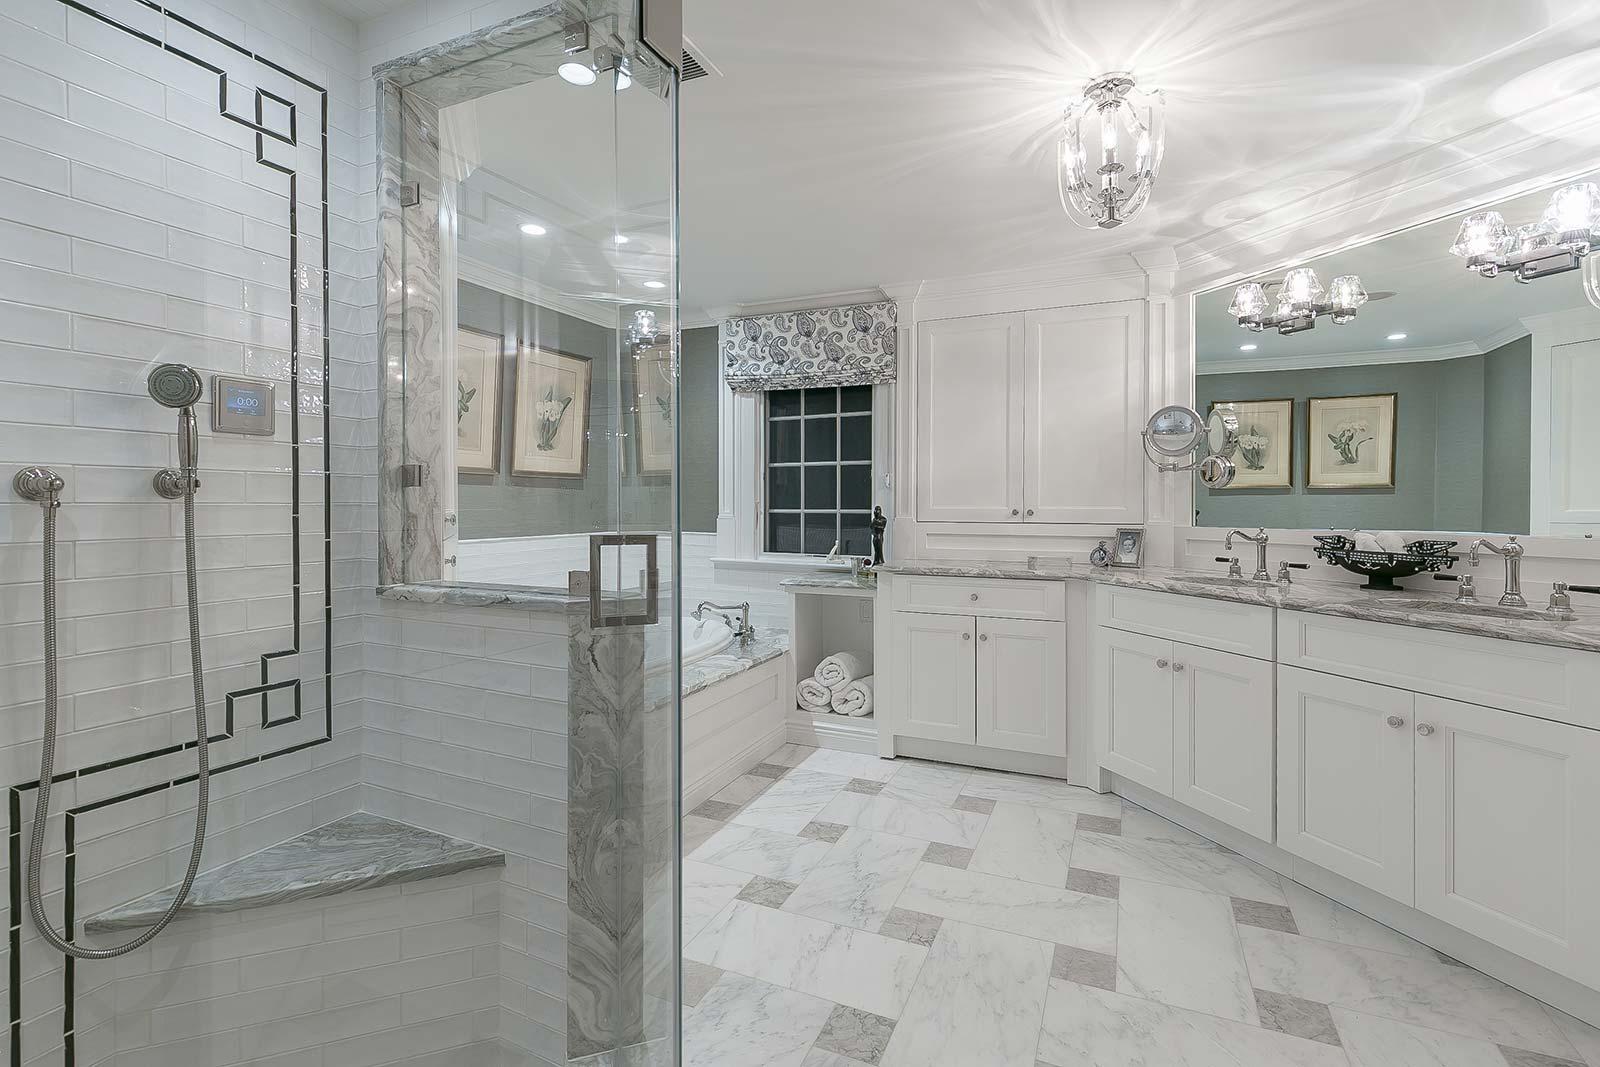 New Jersey Interior Designers, Top 20 Bathroom Designs new jersey interior designers New Jersey Interior Designers, Top 20 Bathroom Designs Schoenbach Thumbnail photo